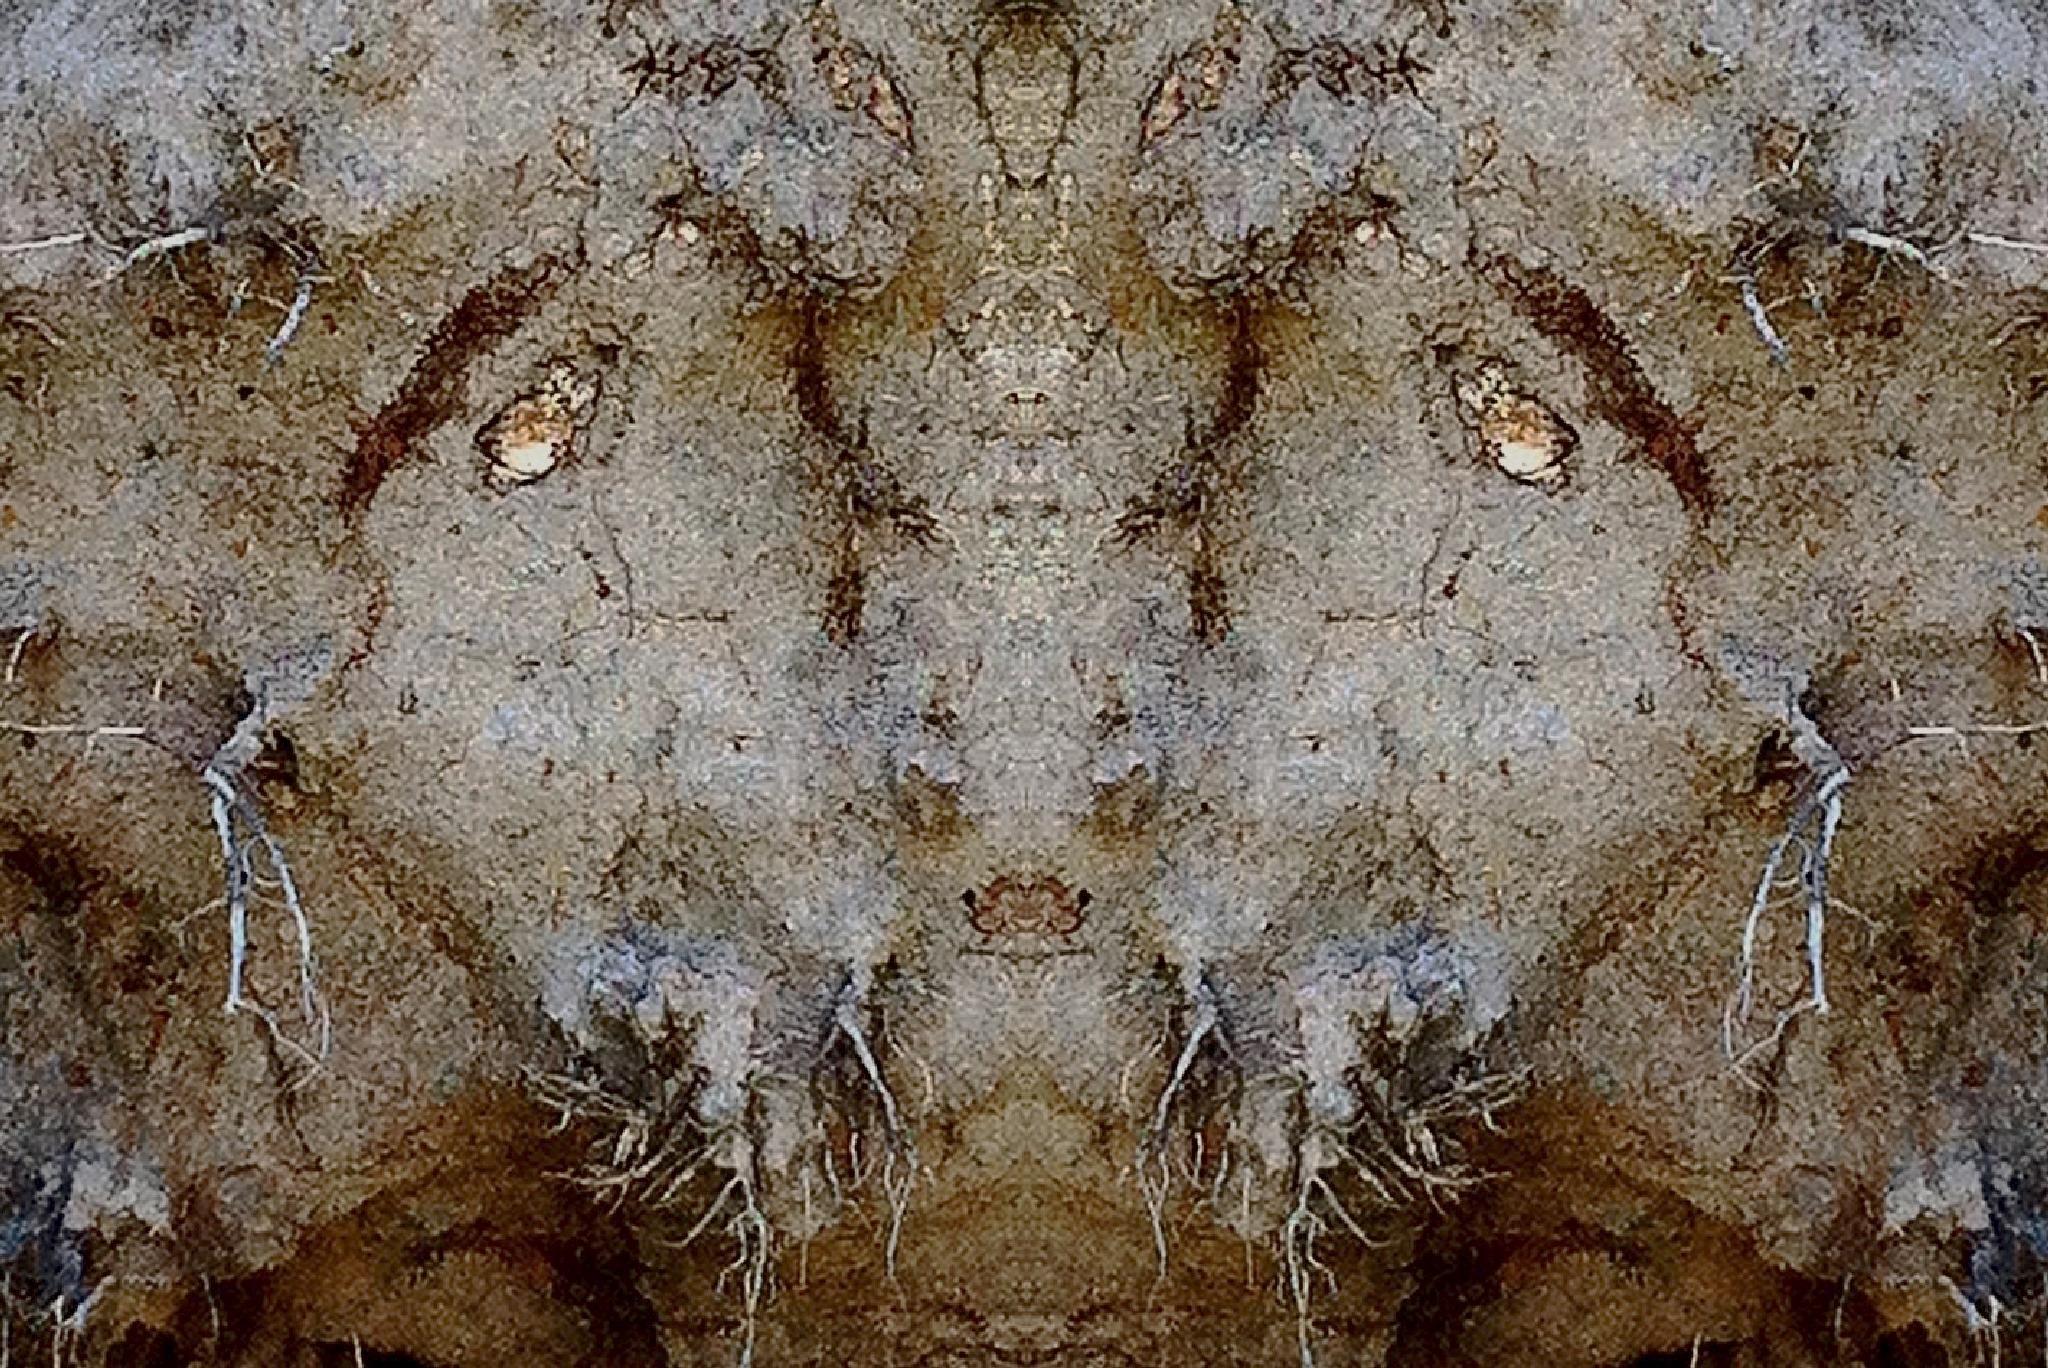 Mud Eye by taconnery